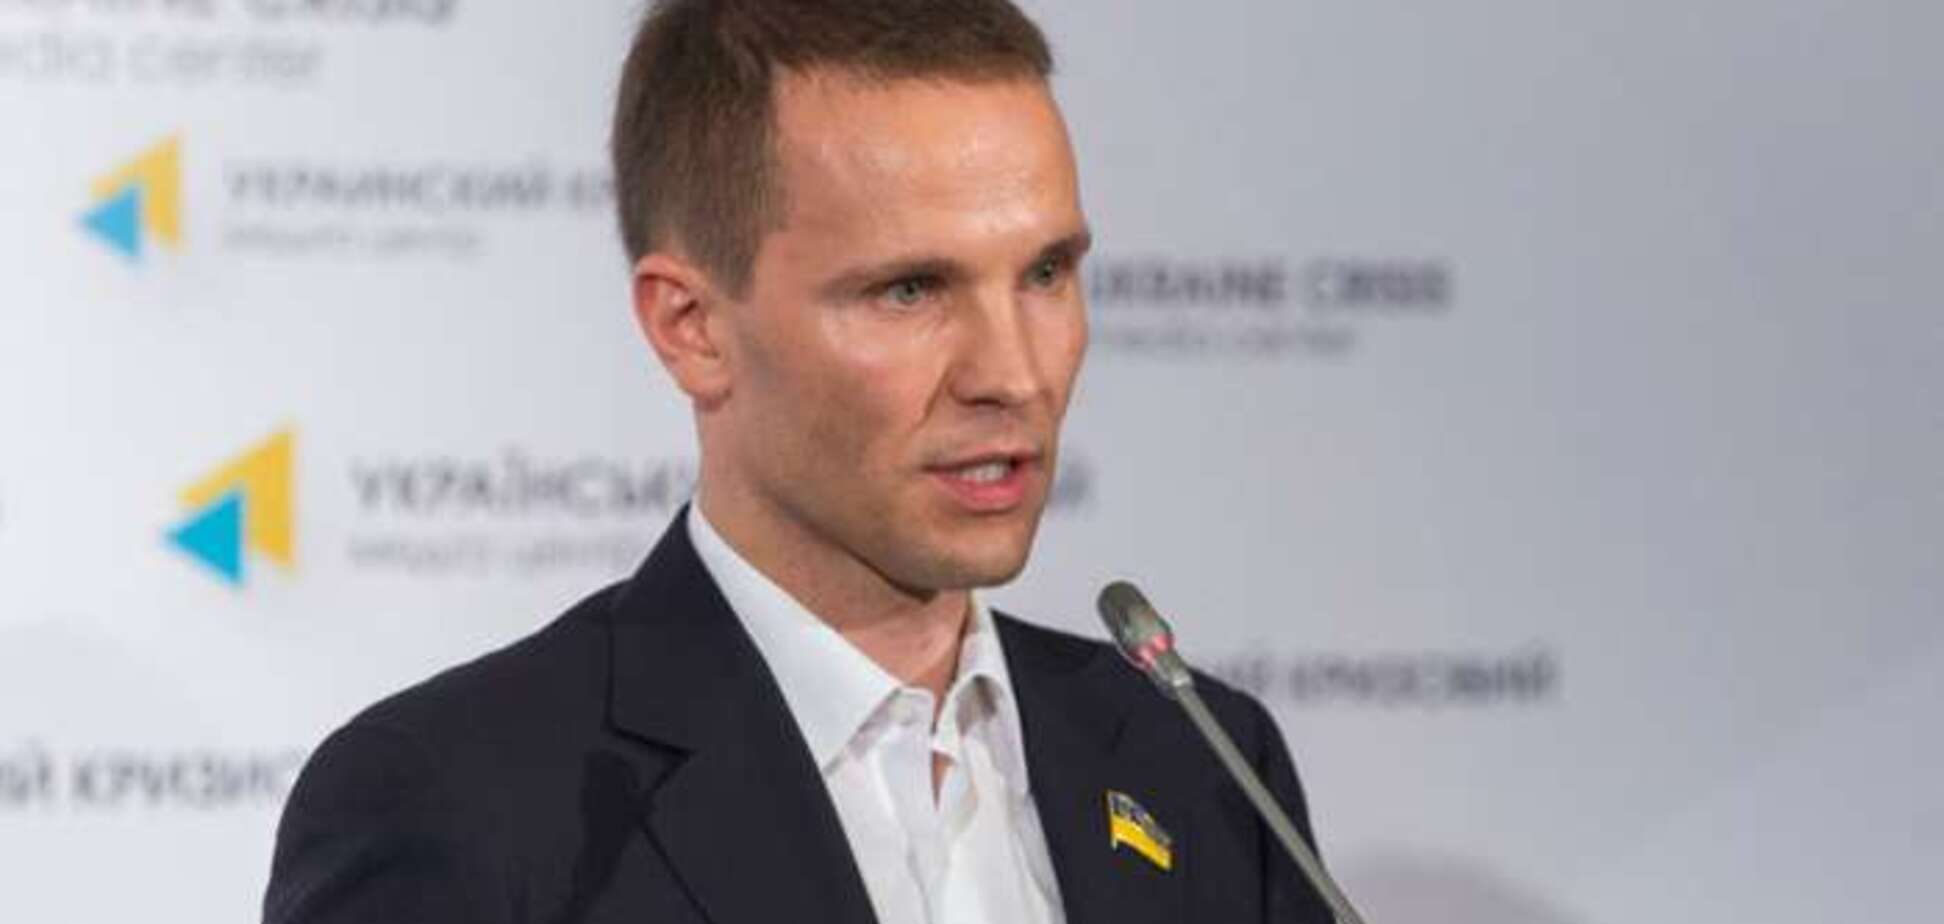 Деревянко заявил об угрозе конституционного переворота